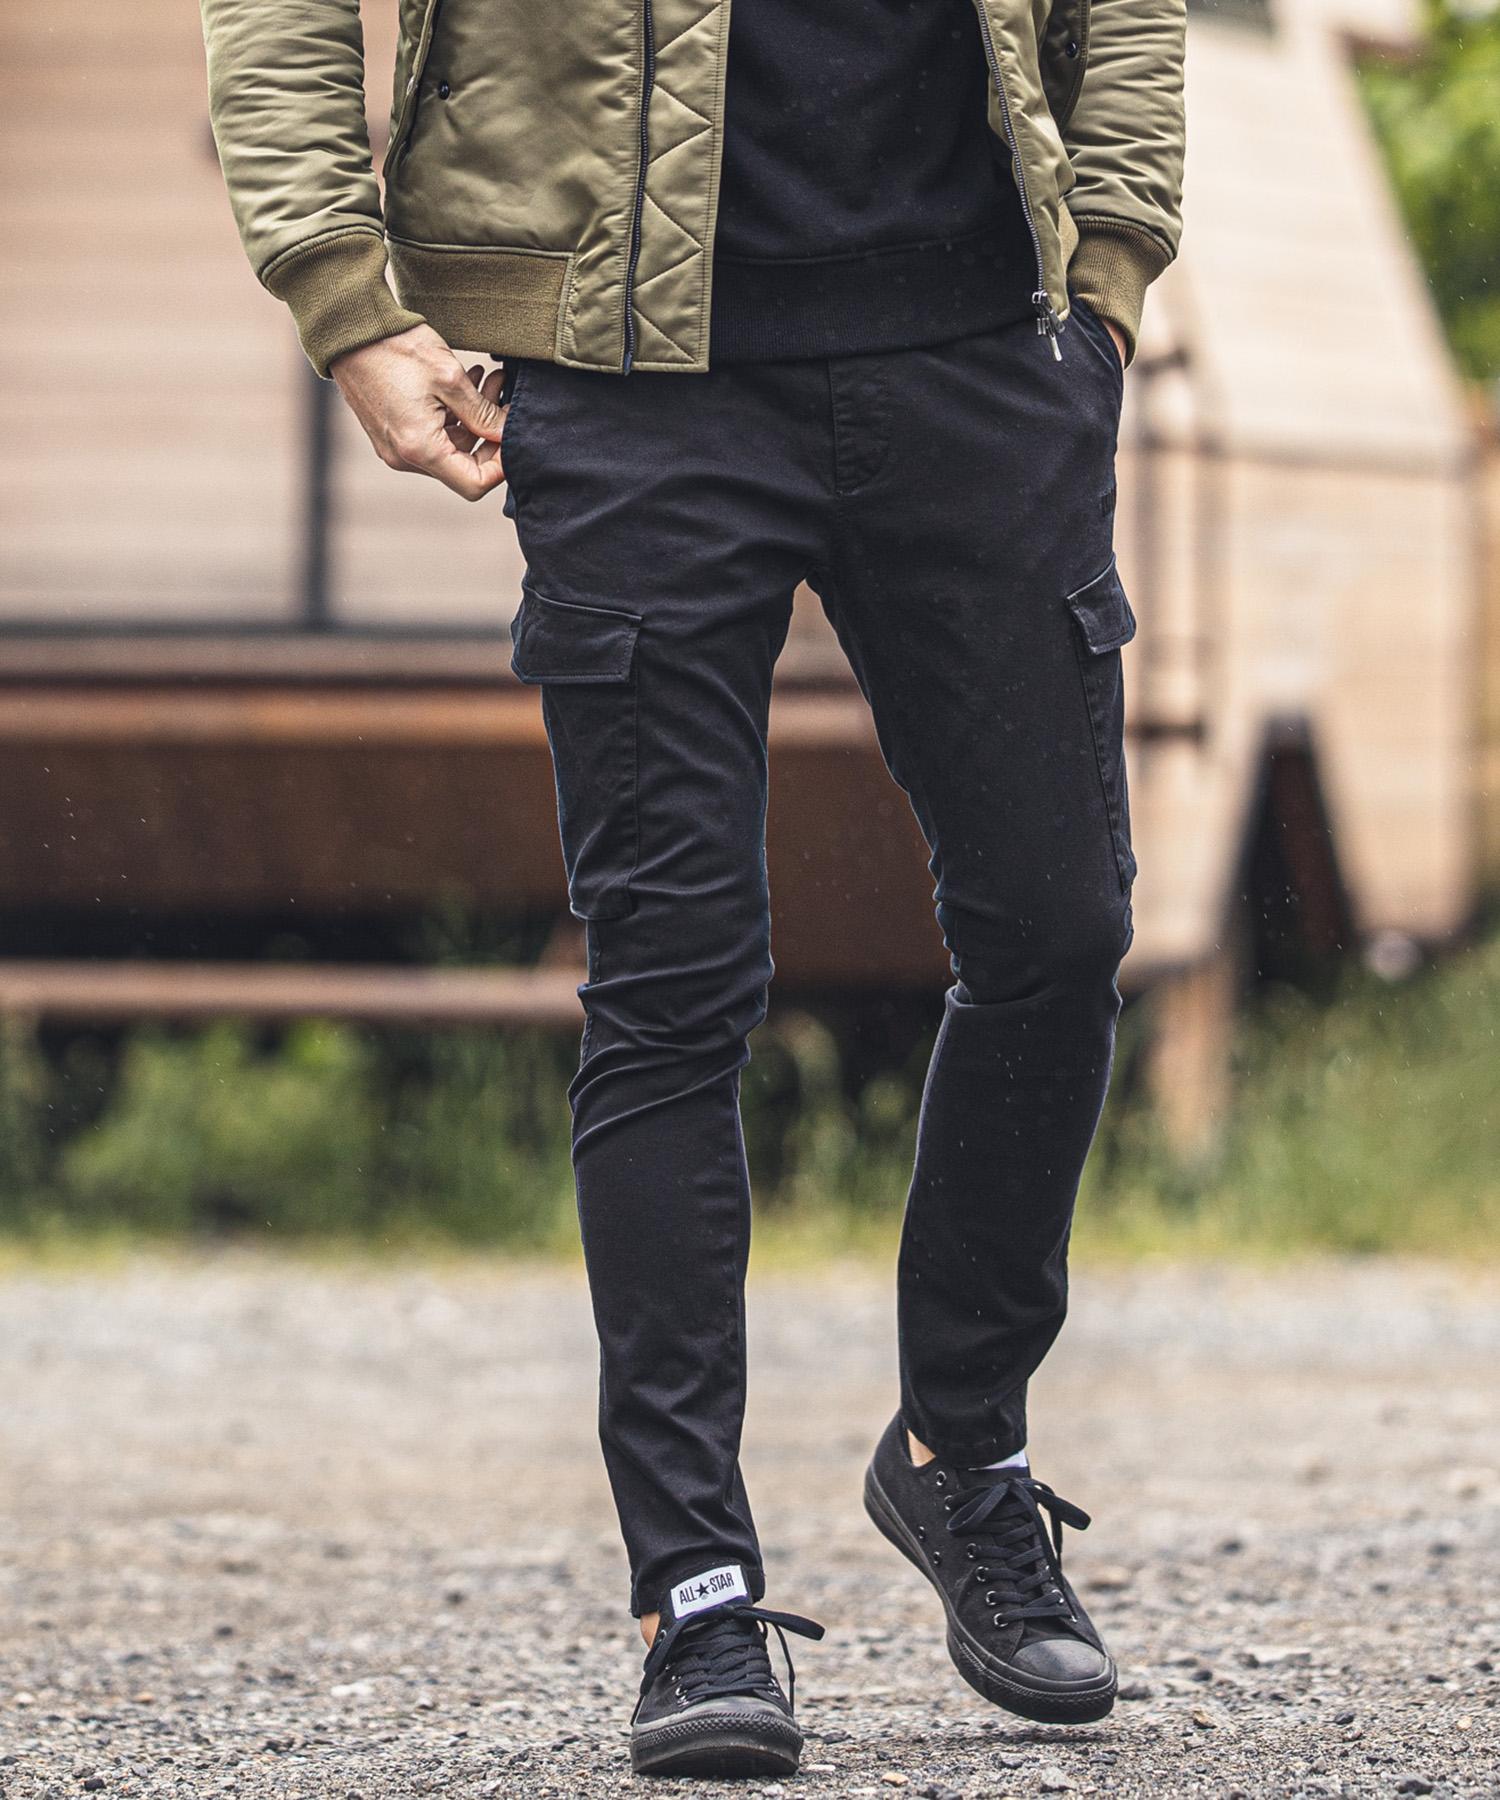 【felkod(フィルコッド)】【予約販売9月中旬~下旬】Tapered Skinny Cargo Easy Pants(F20W290)